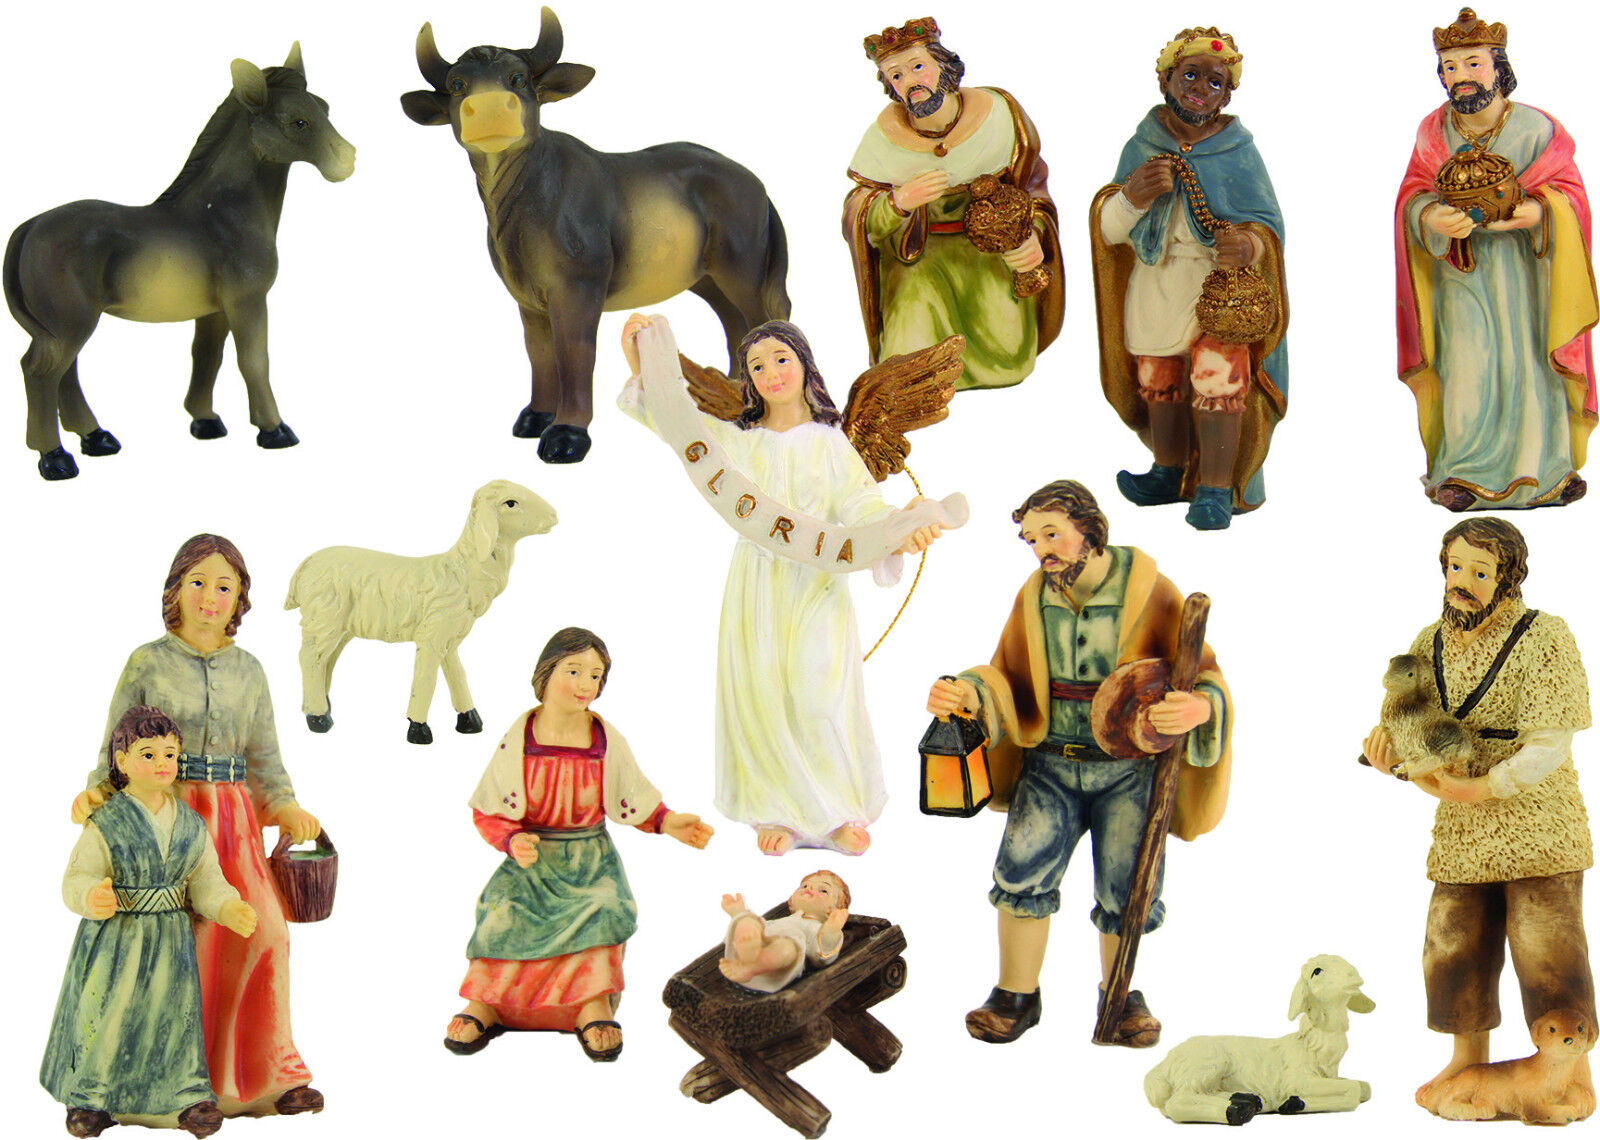 Weihnachtskrippe Krippenfiguren Bauernkrippe 13-teilig 13-teilig 13-teilig Figurengröße 10 cm fcea5b